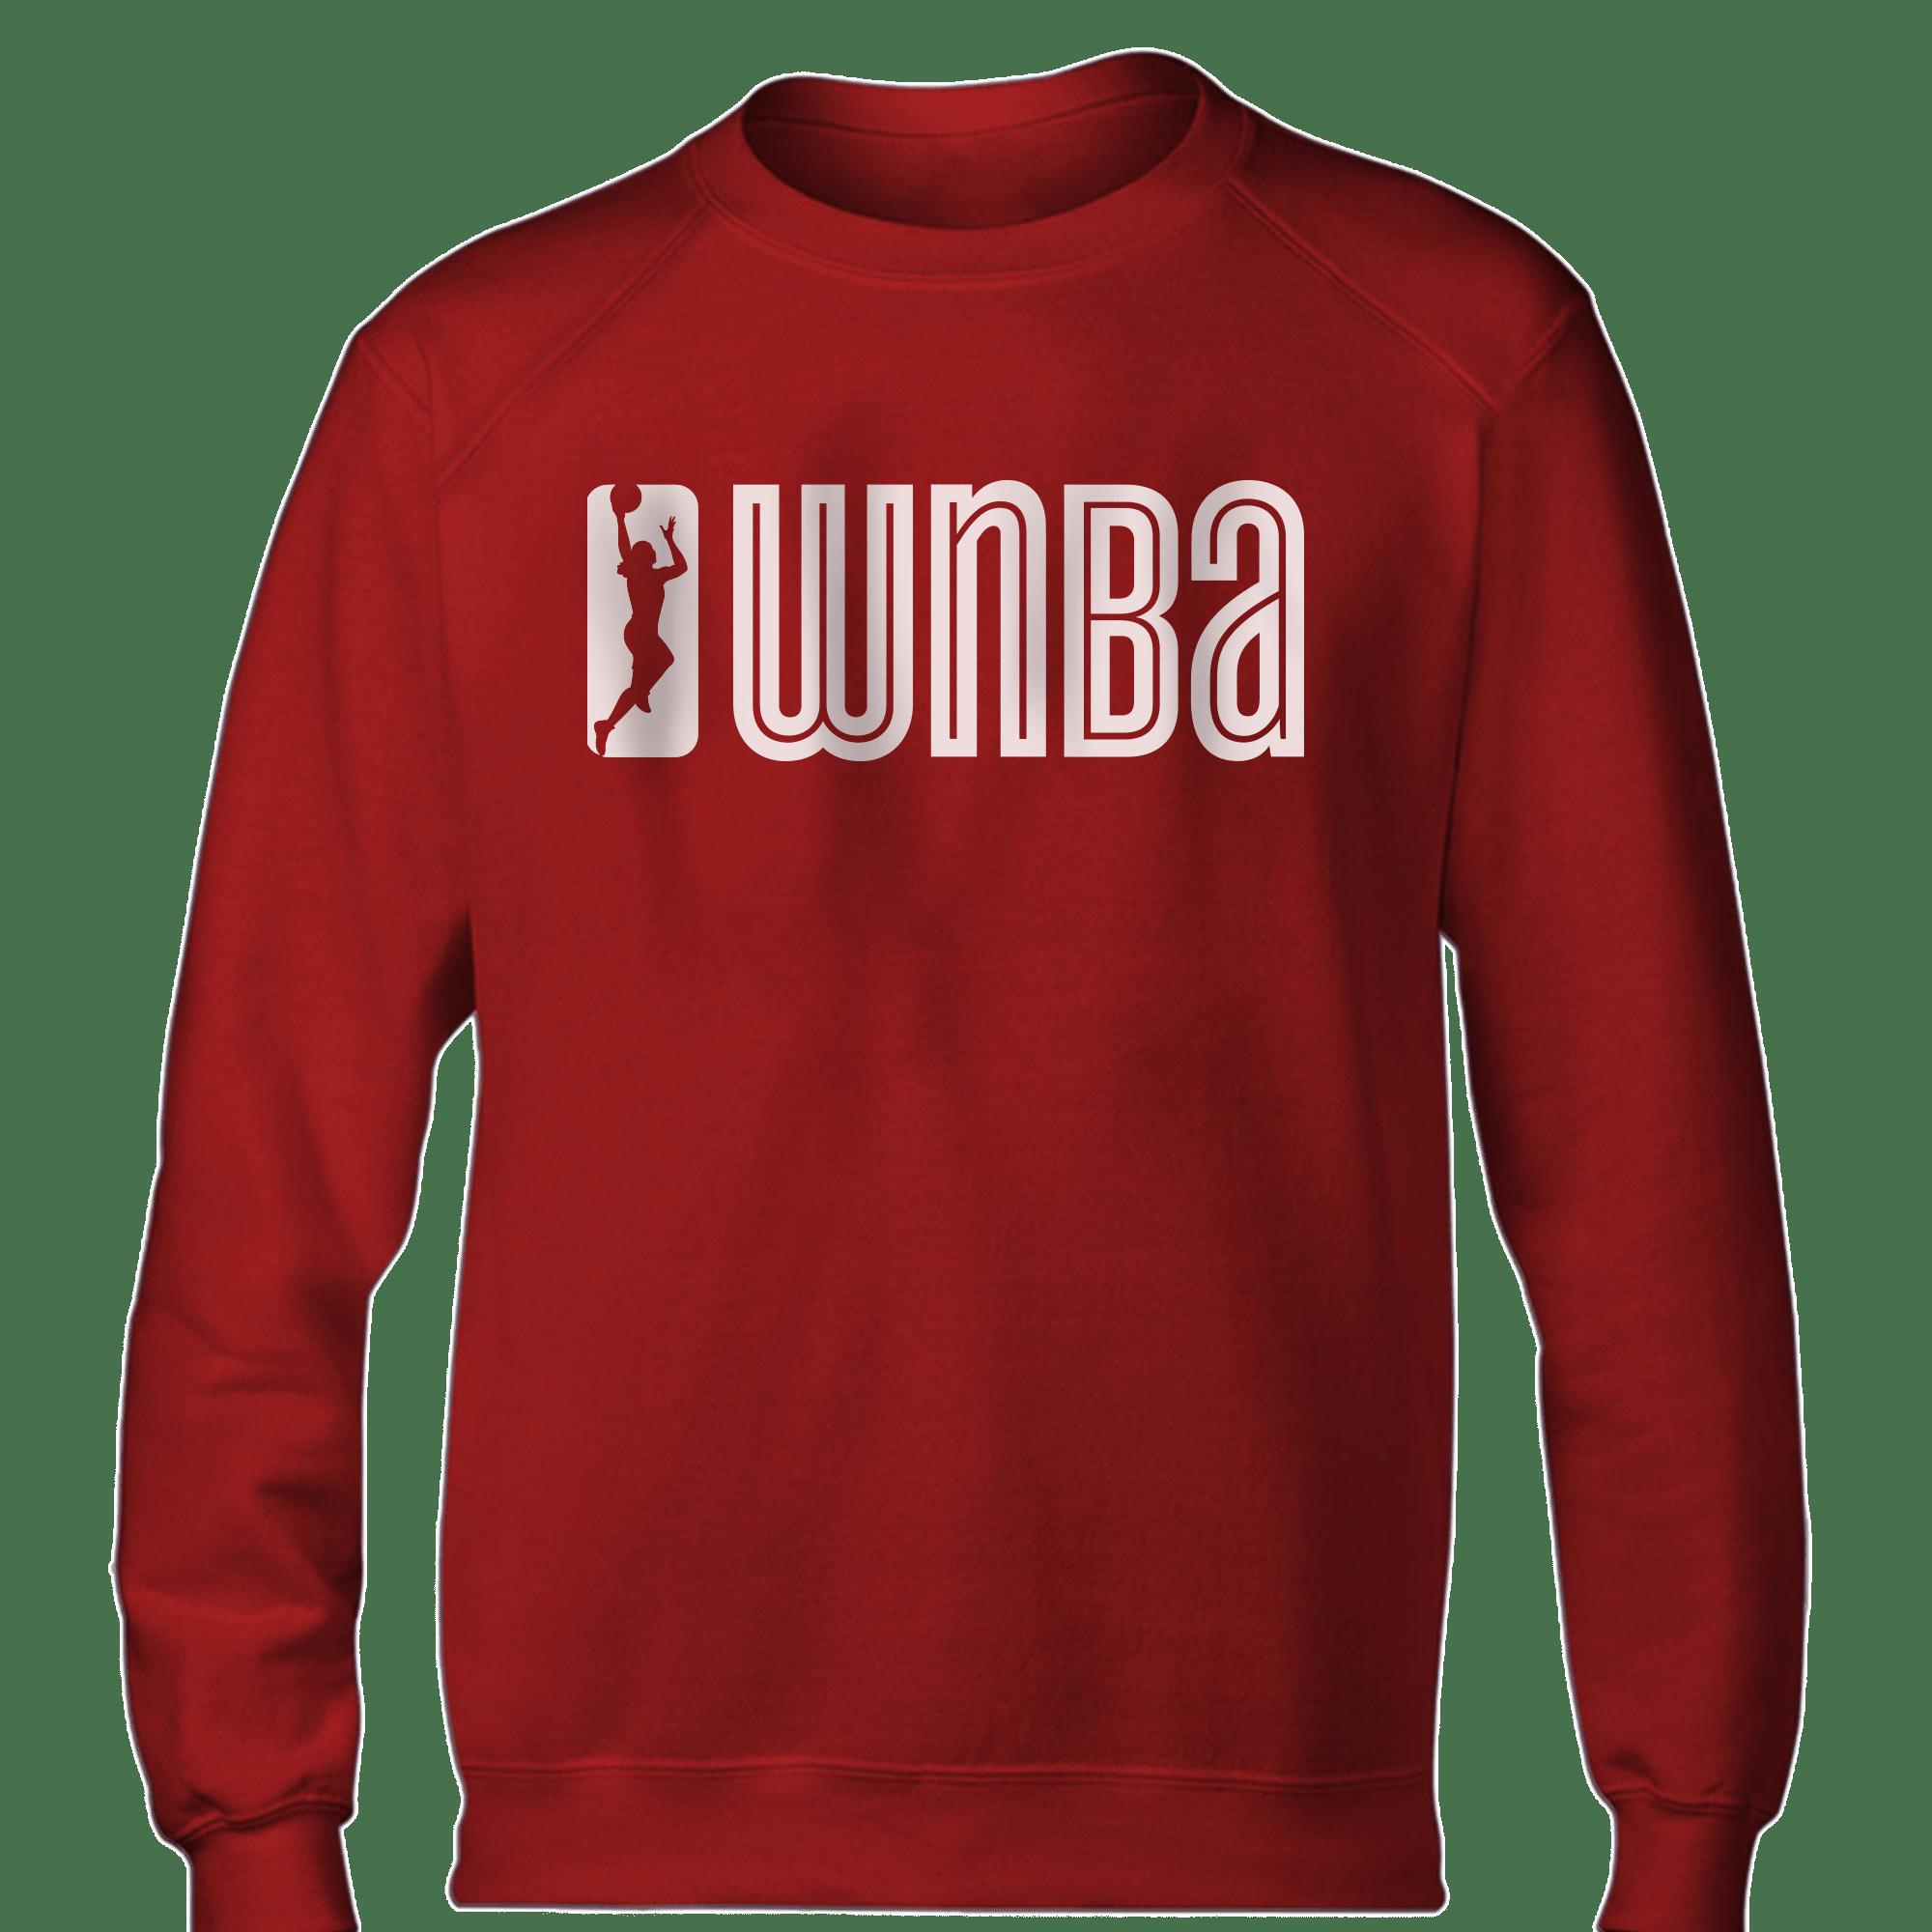 WNBA Basic (BSC-RED-NP-WNBA-633)